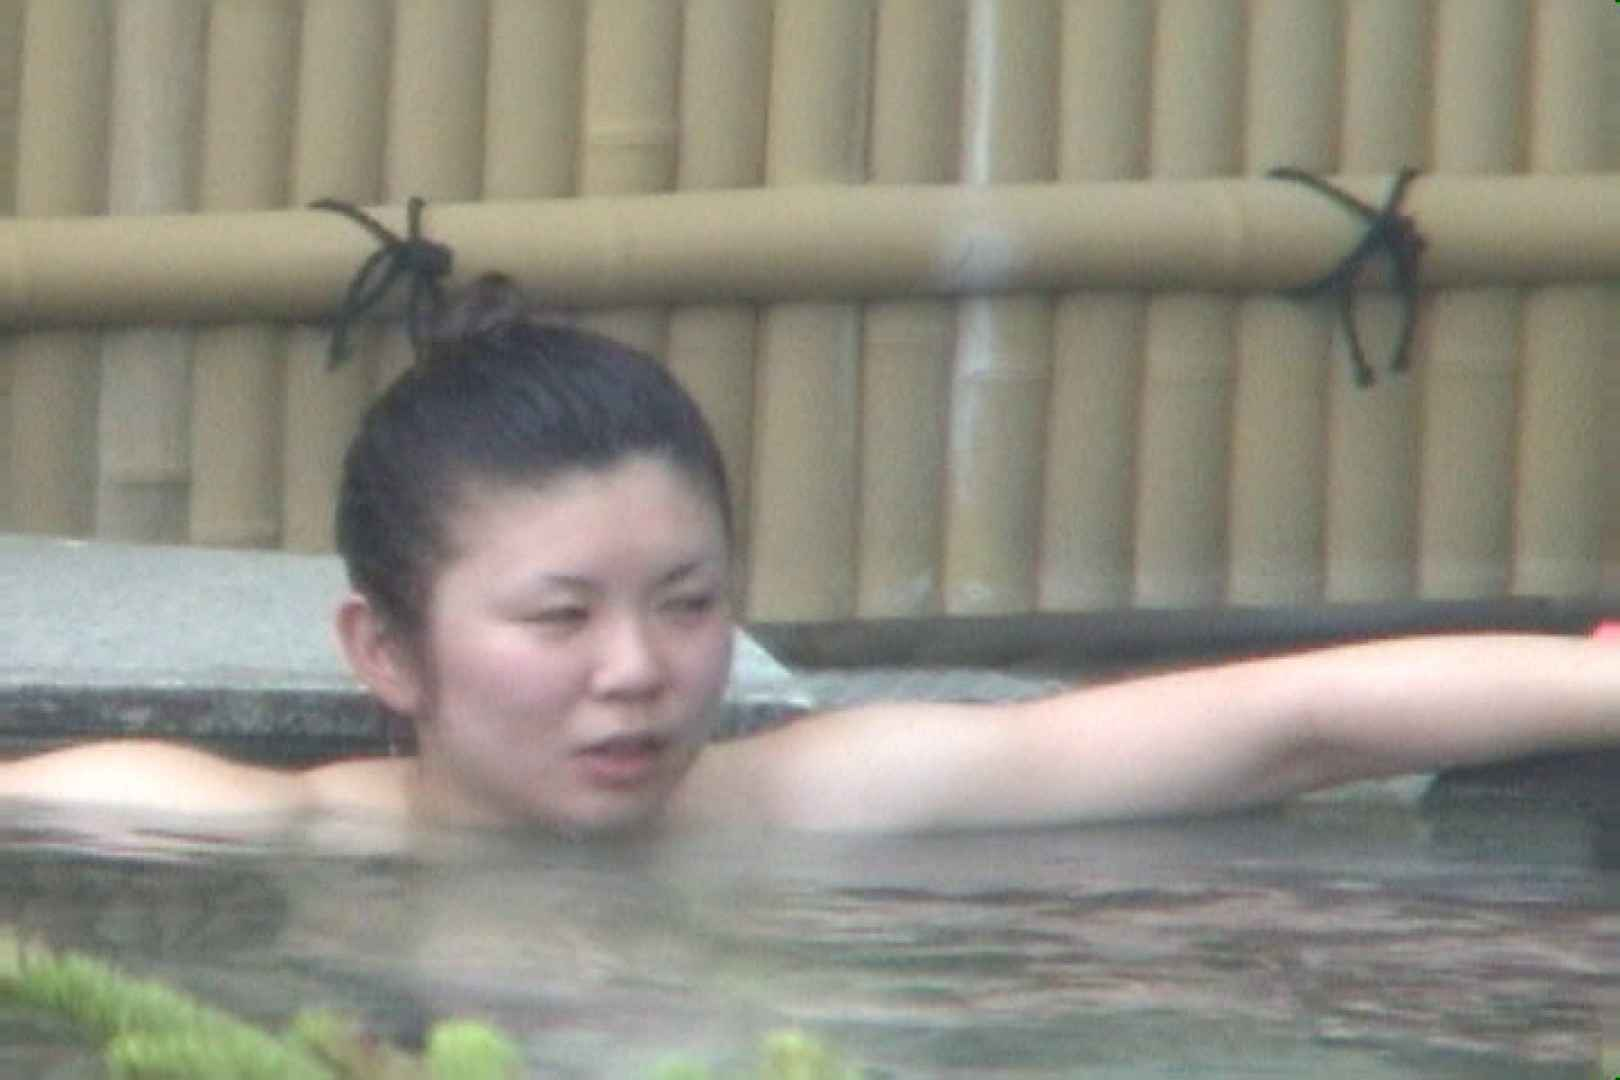 Aquaな露天風呂Vol.47【VIP限定】 露天風呂突入 オマンコ無修正動画無料 94pic 5